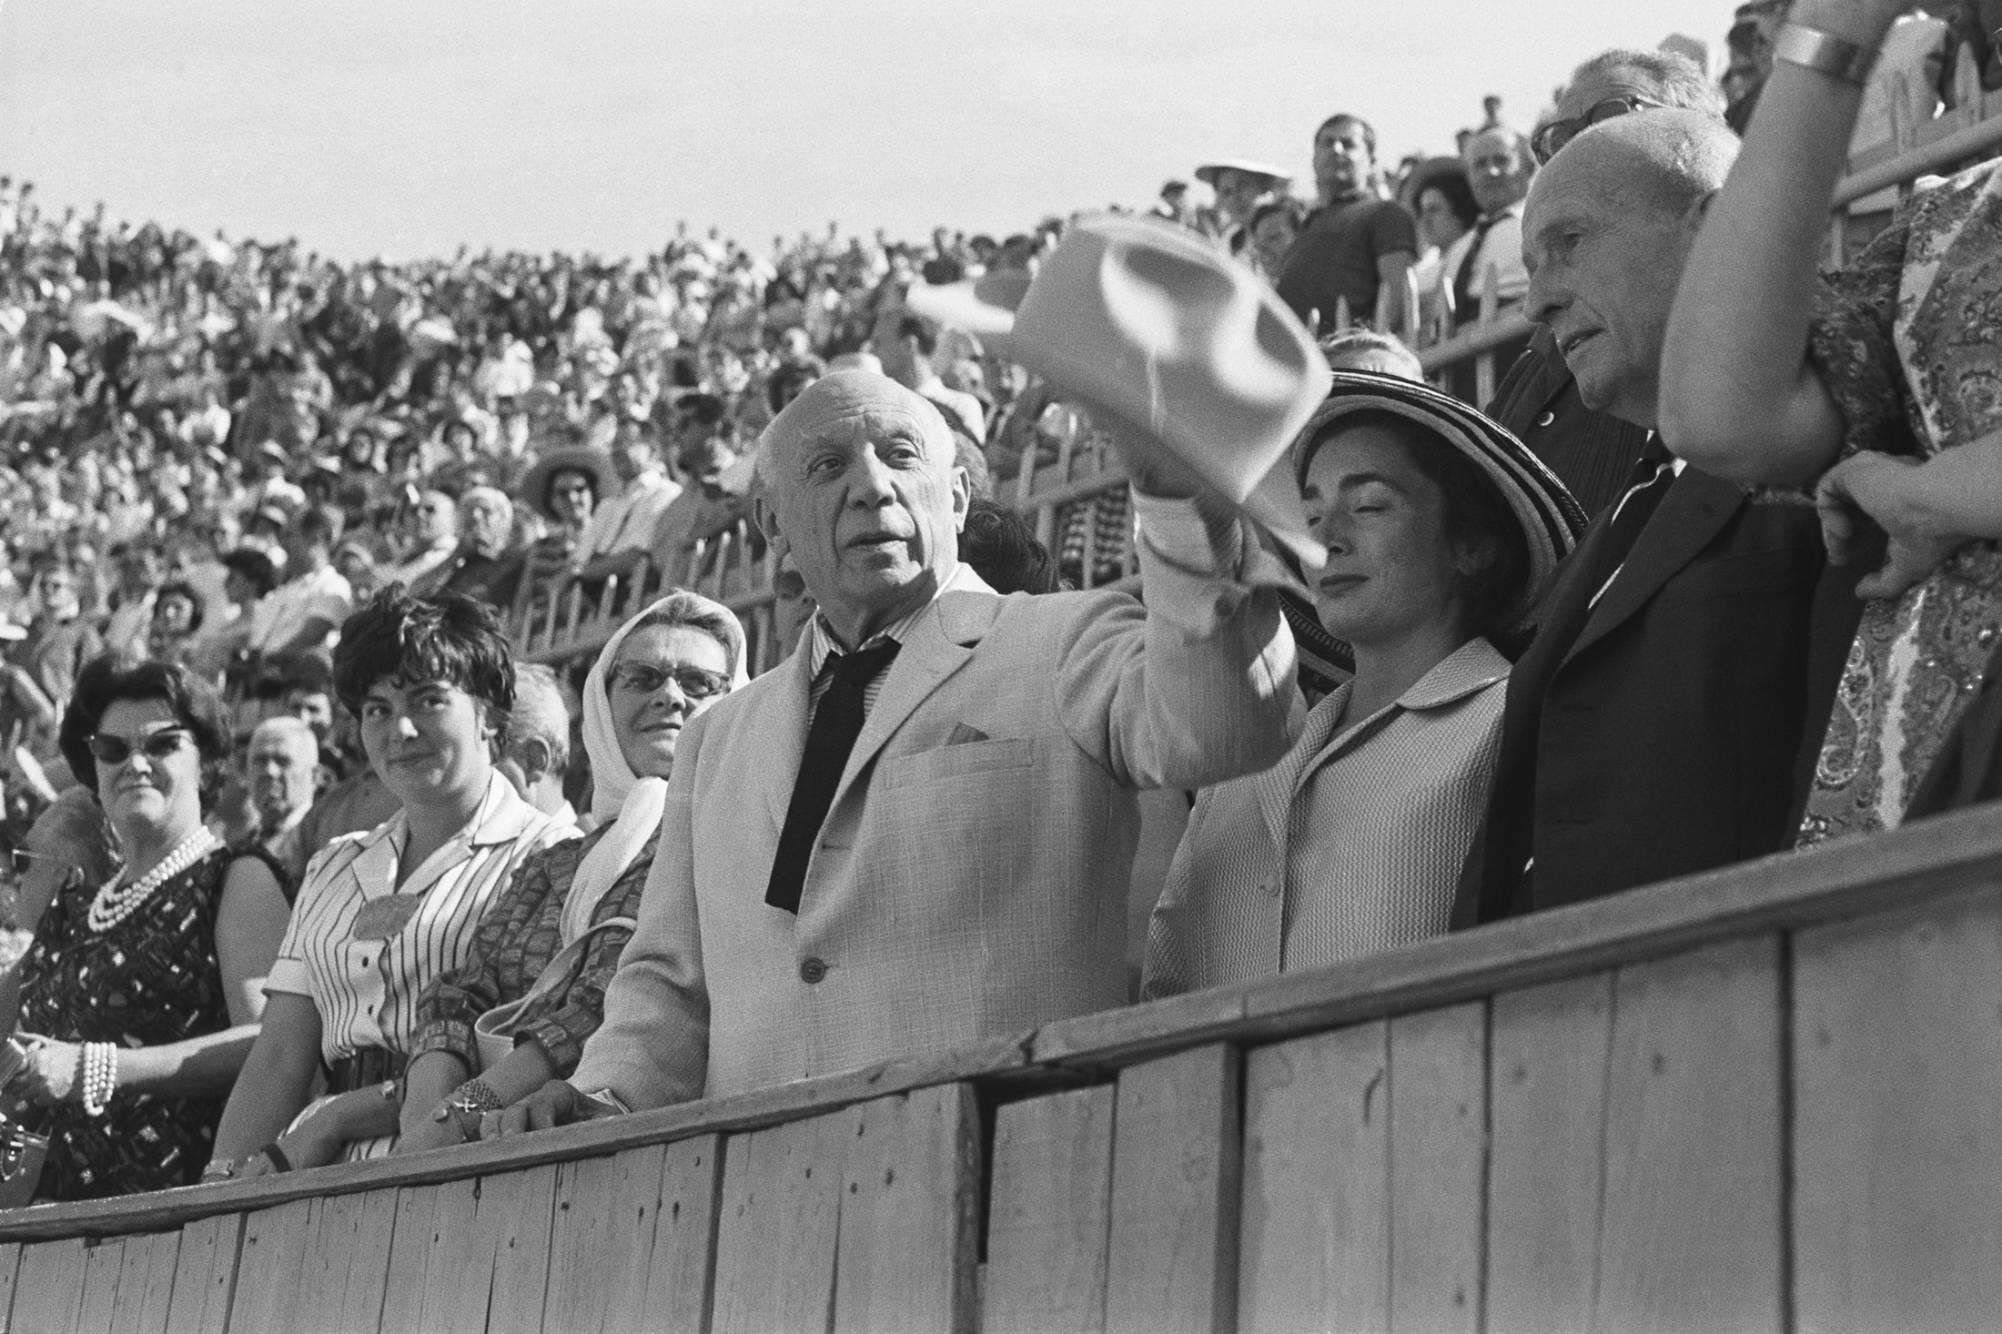 Picasso watching corrida